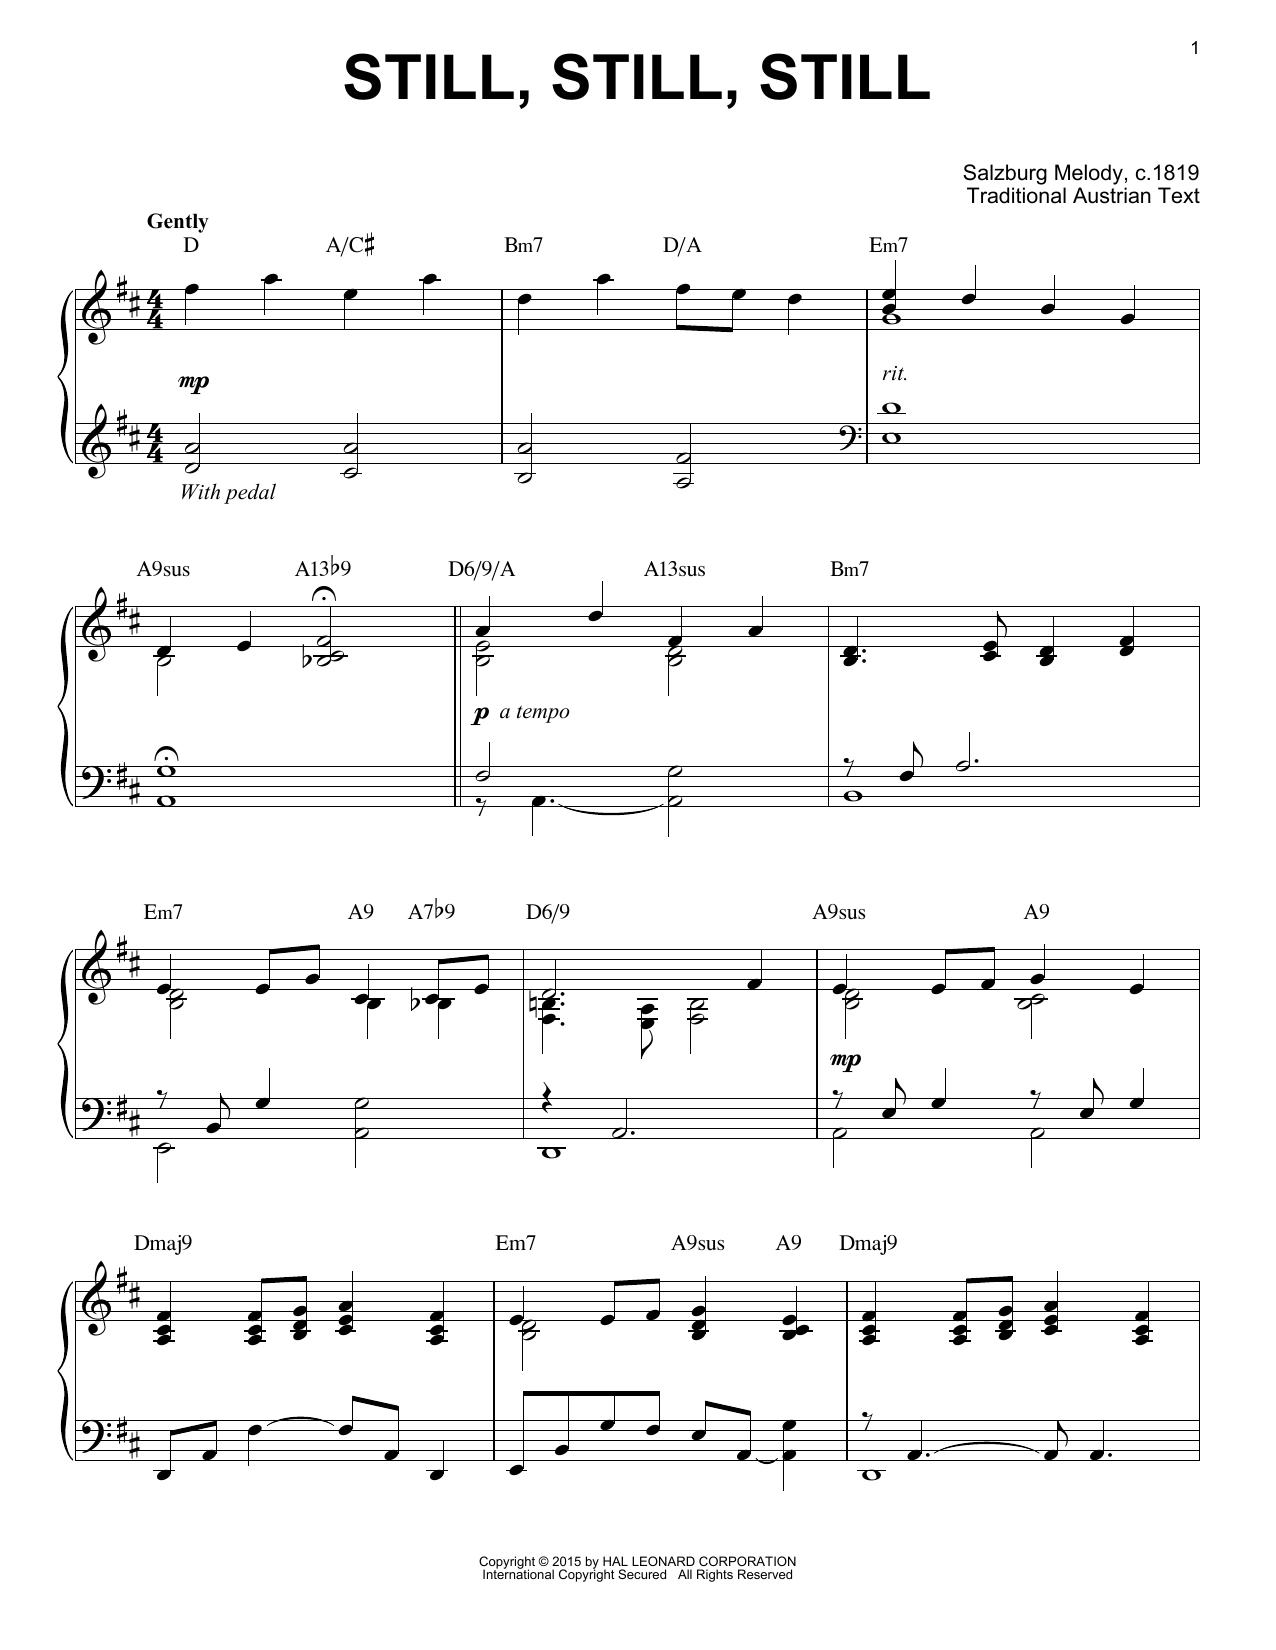 Salzburg Melody c.1819